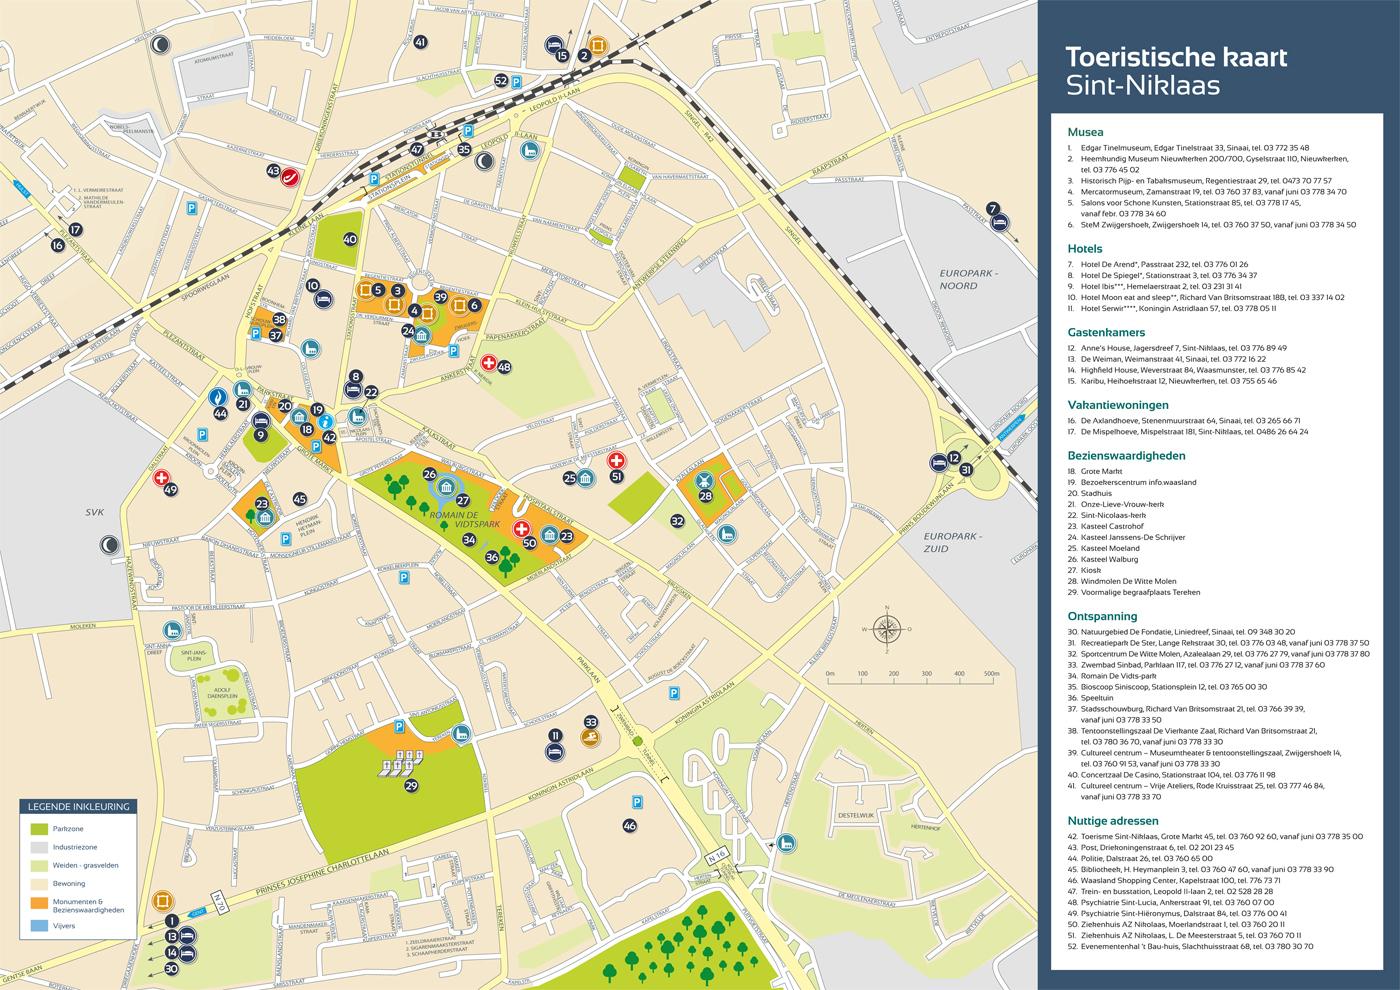 Toeristische kaart - Tourist map Sint-Niklaas, Bert Vanden Berghe 2012